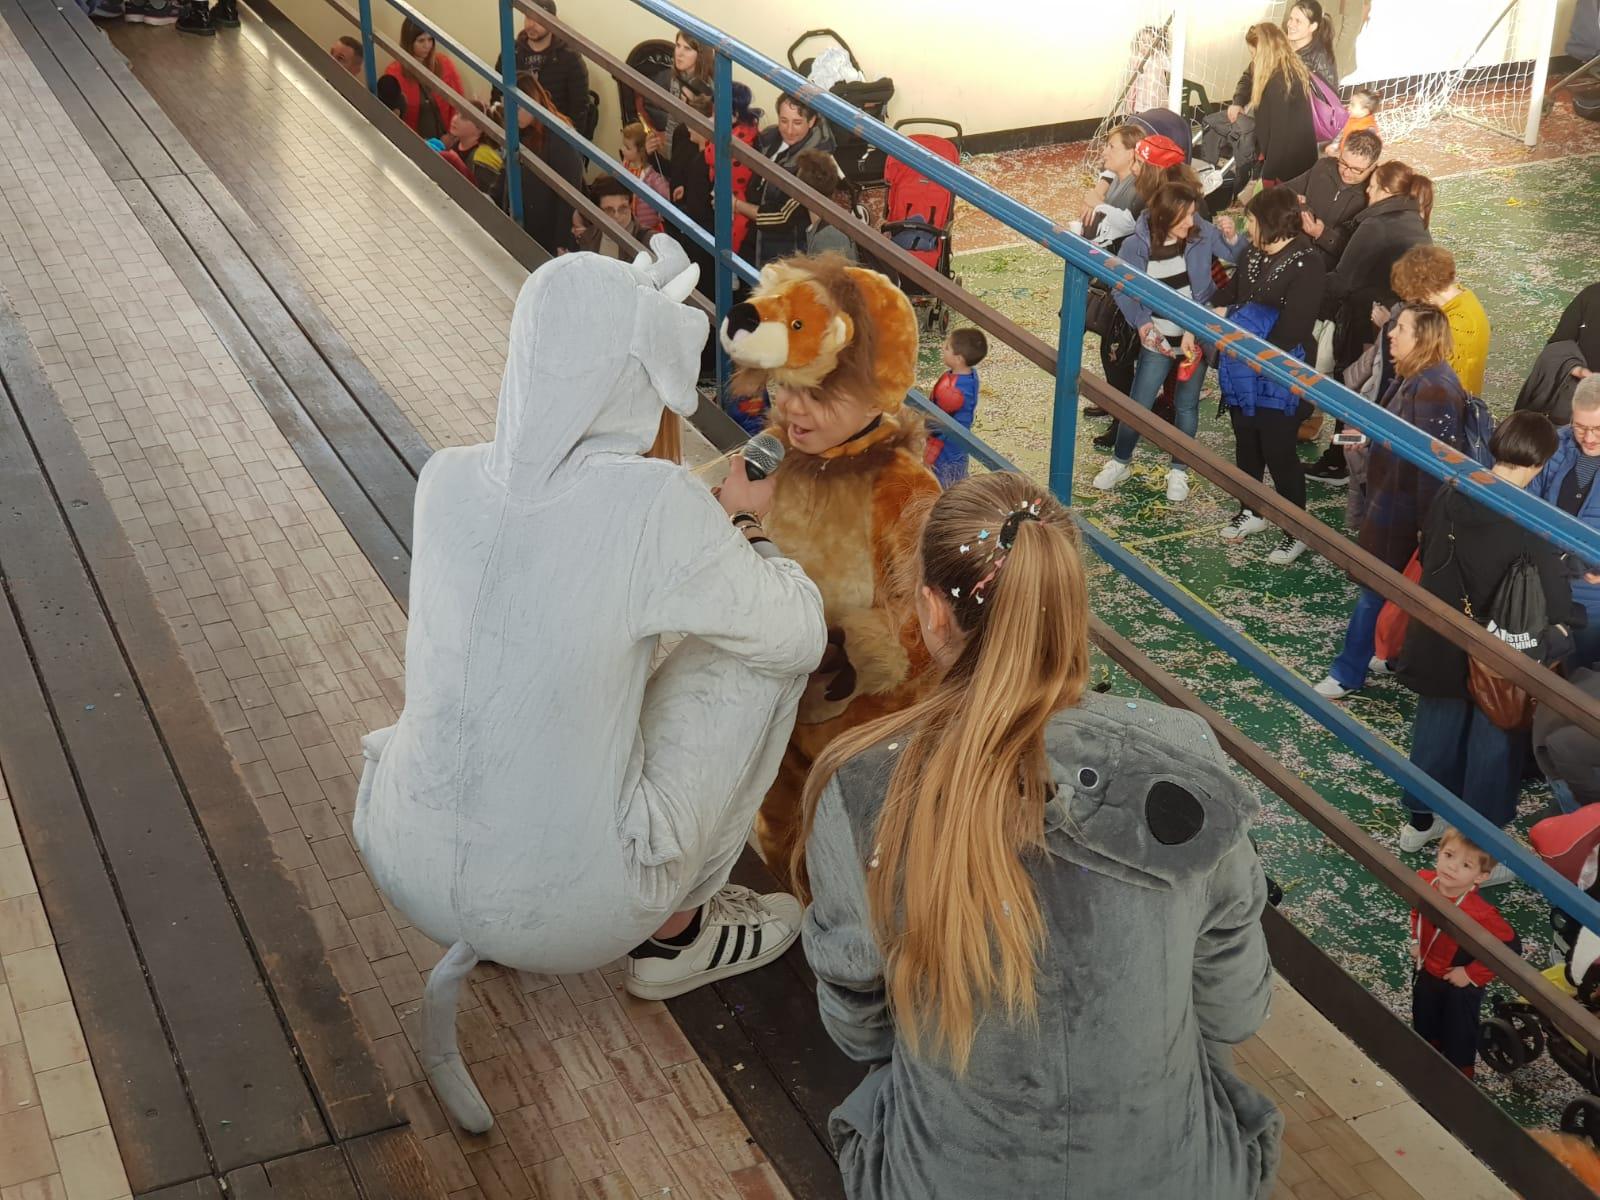 Baraonda Carnevale 2019 (207)